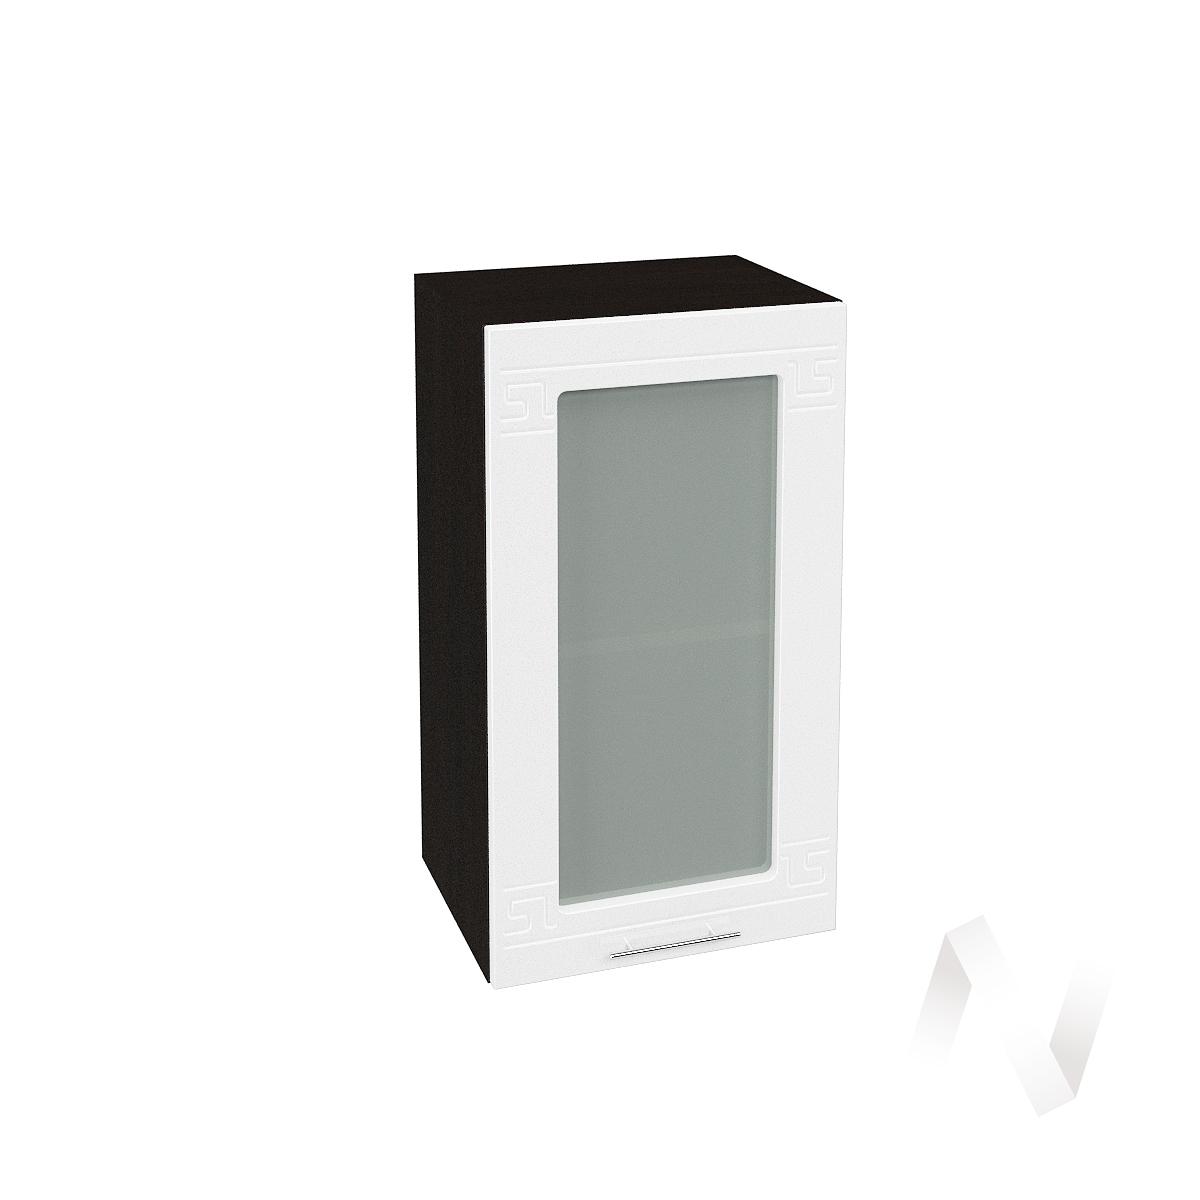 "Кухня ""Греция"": Шкаф верхний со стеклом 400, ШВС 400 (белый металлик/корпус венге)"